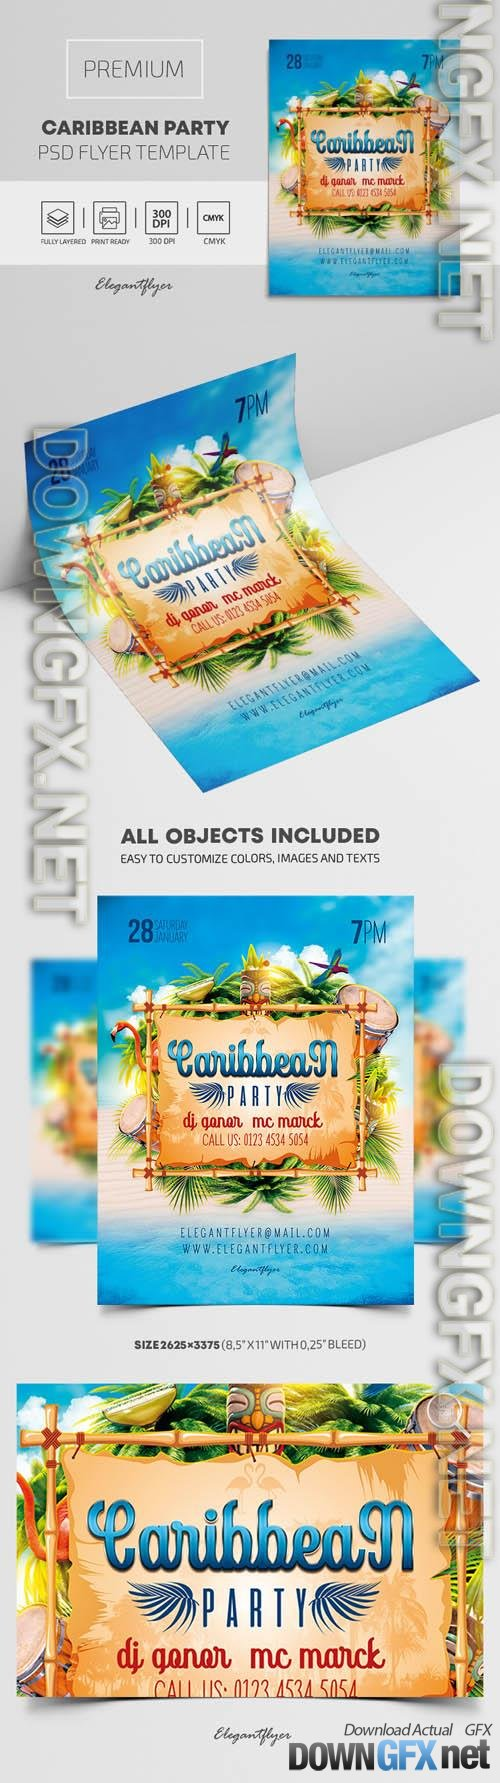 Caribbean Party Premium PSD Flyer Template